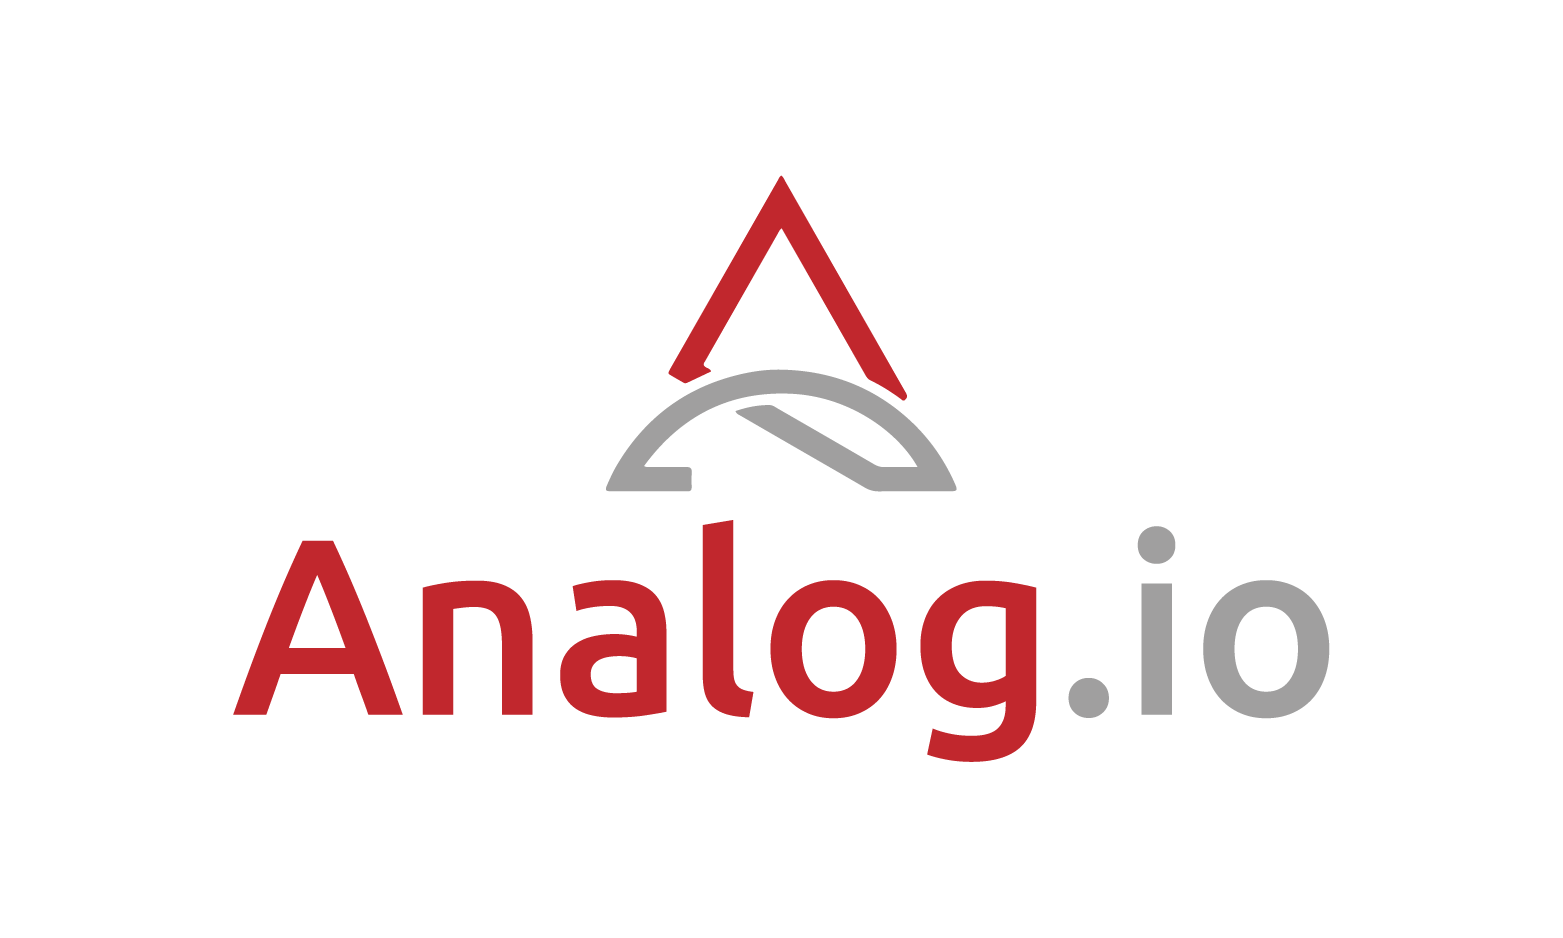 Analog.io